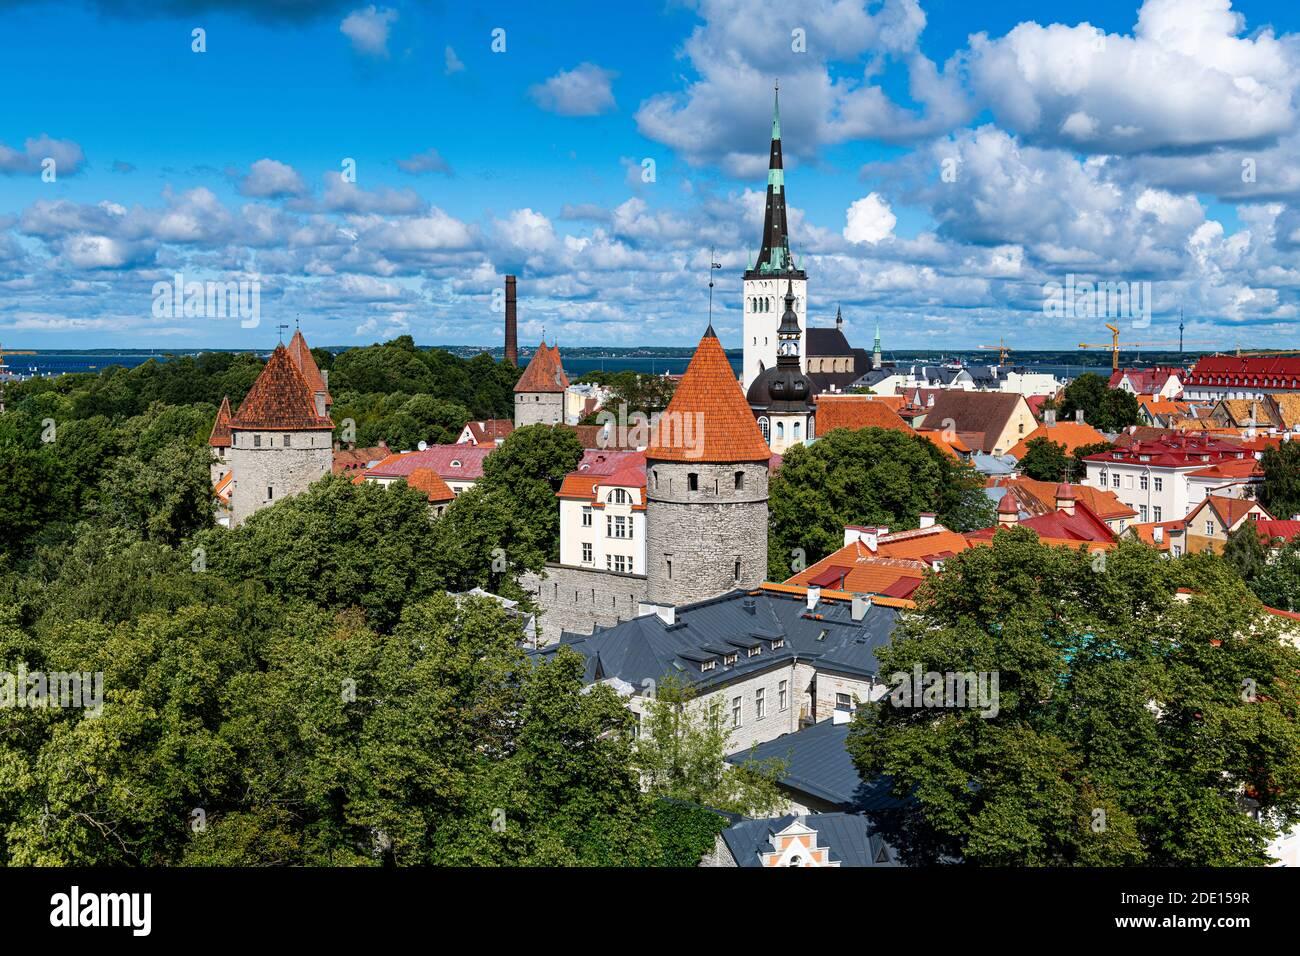 View over the Old Town of Tallinn, UNESCO World Heritage Site, Estonia, Europe Stock Photo